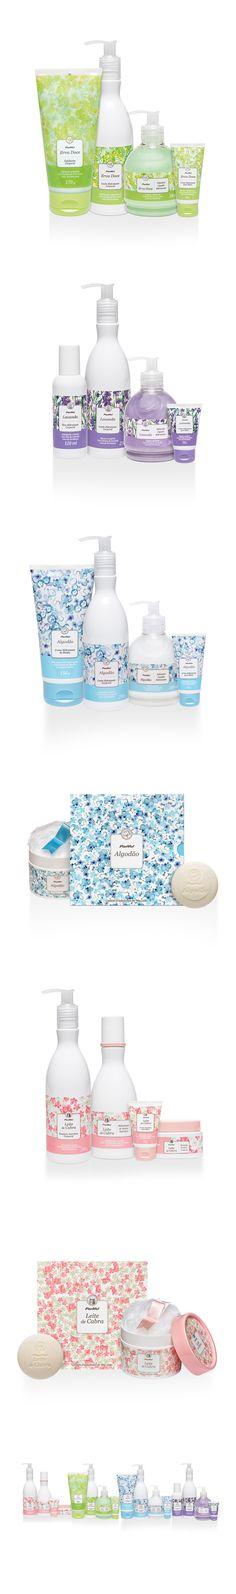 Panvel Natural • Branding and Package Design on Behance by Carmelita Design, Porto Alegre, Brazil. Branding and packaging design for Panvel Natural: Leite de Cabra / Erva Doce / Algodão / Lavanda. PD